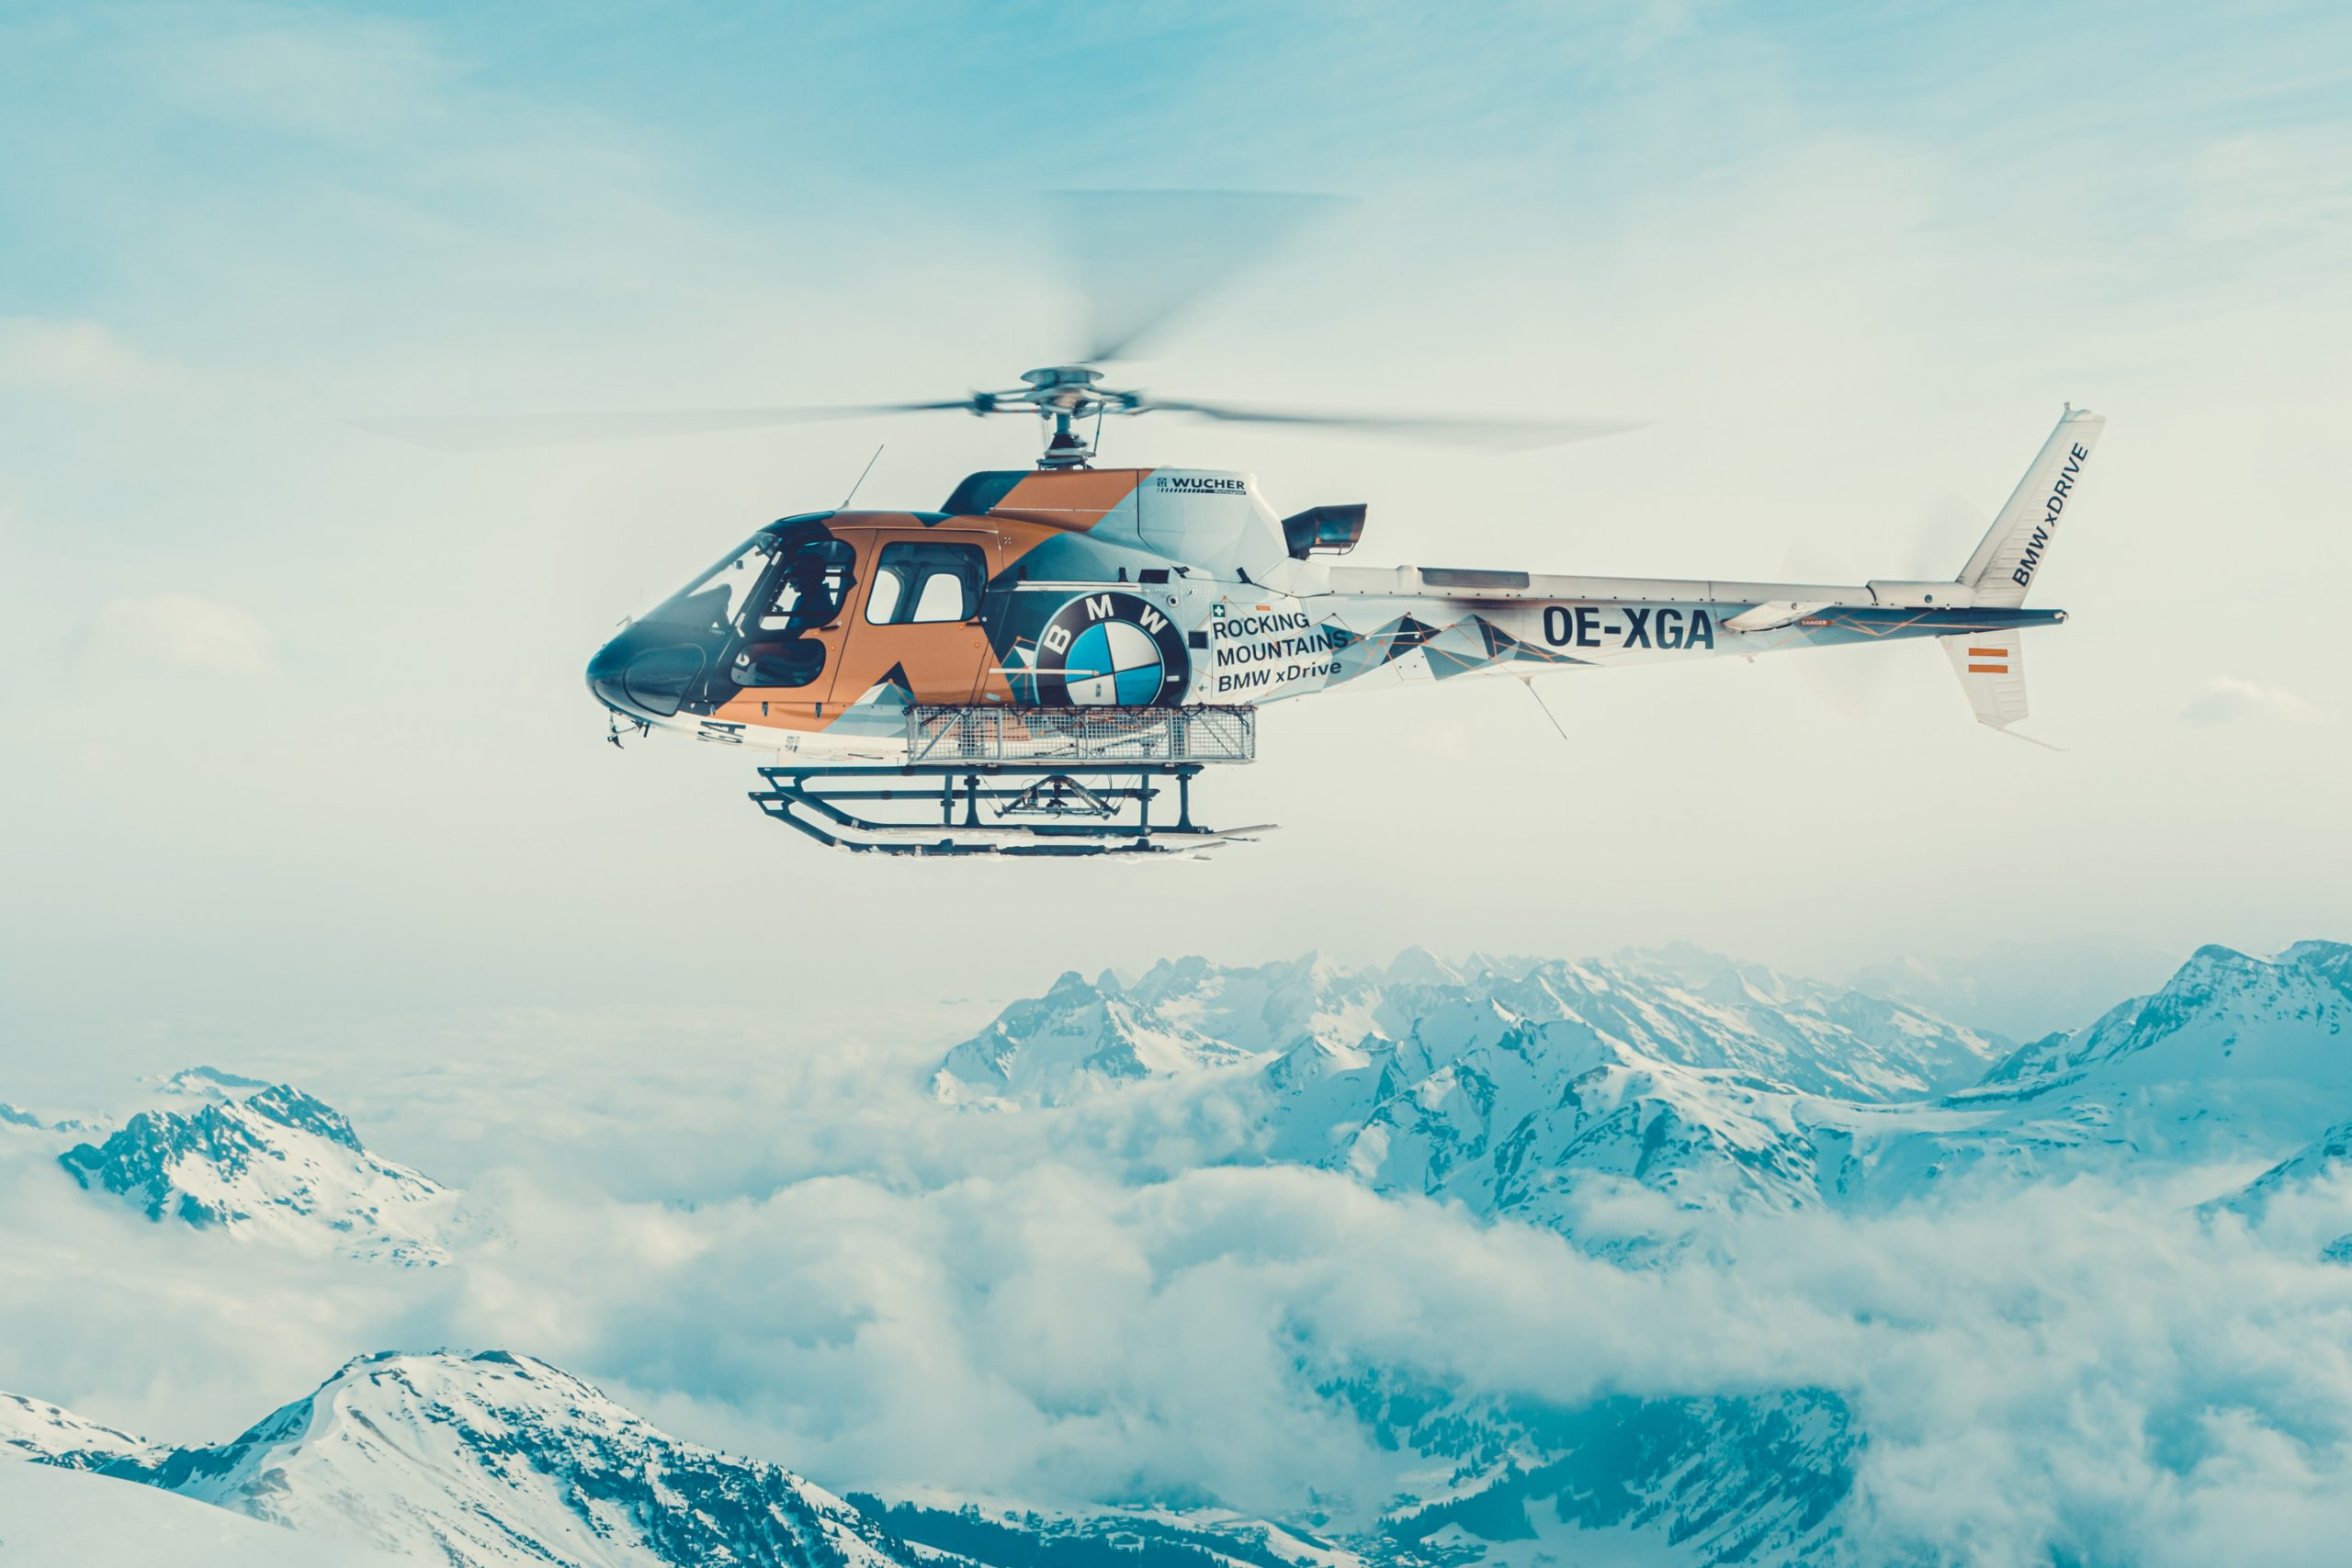 Heliskiing Luftaufnahme BMW Rocking Mountains xDrive Helicopter am Mehlsack am Arlberg